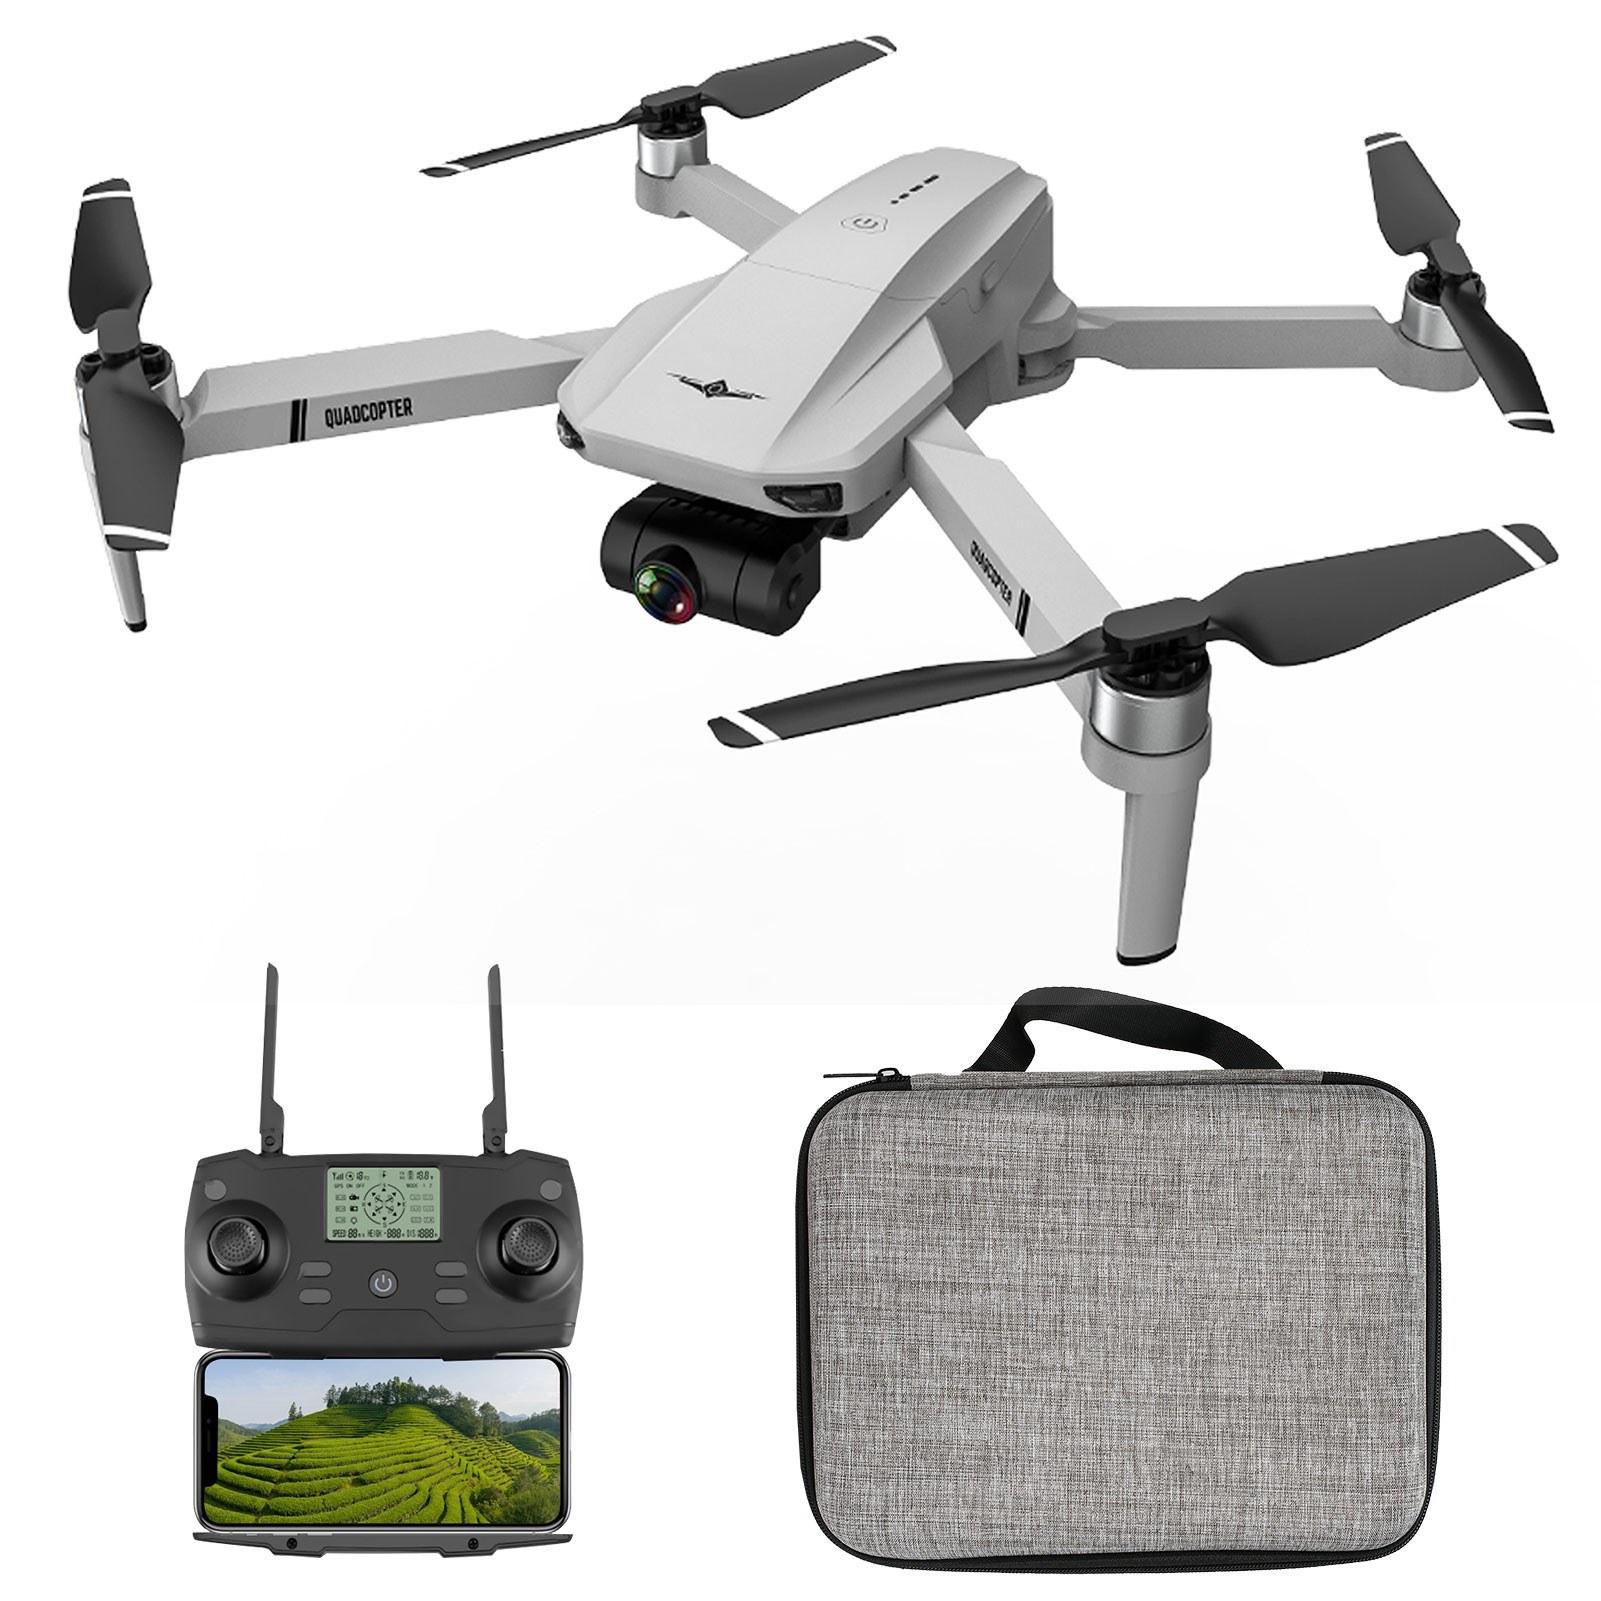 Tomtop - 54% OFF KFPLAN KF102 5G Wifi FPV GPS 4K Camera RC Drone, Free Shipping $117.99